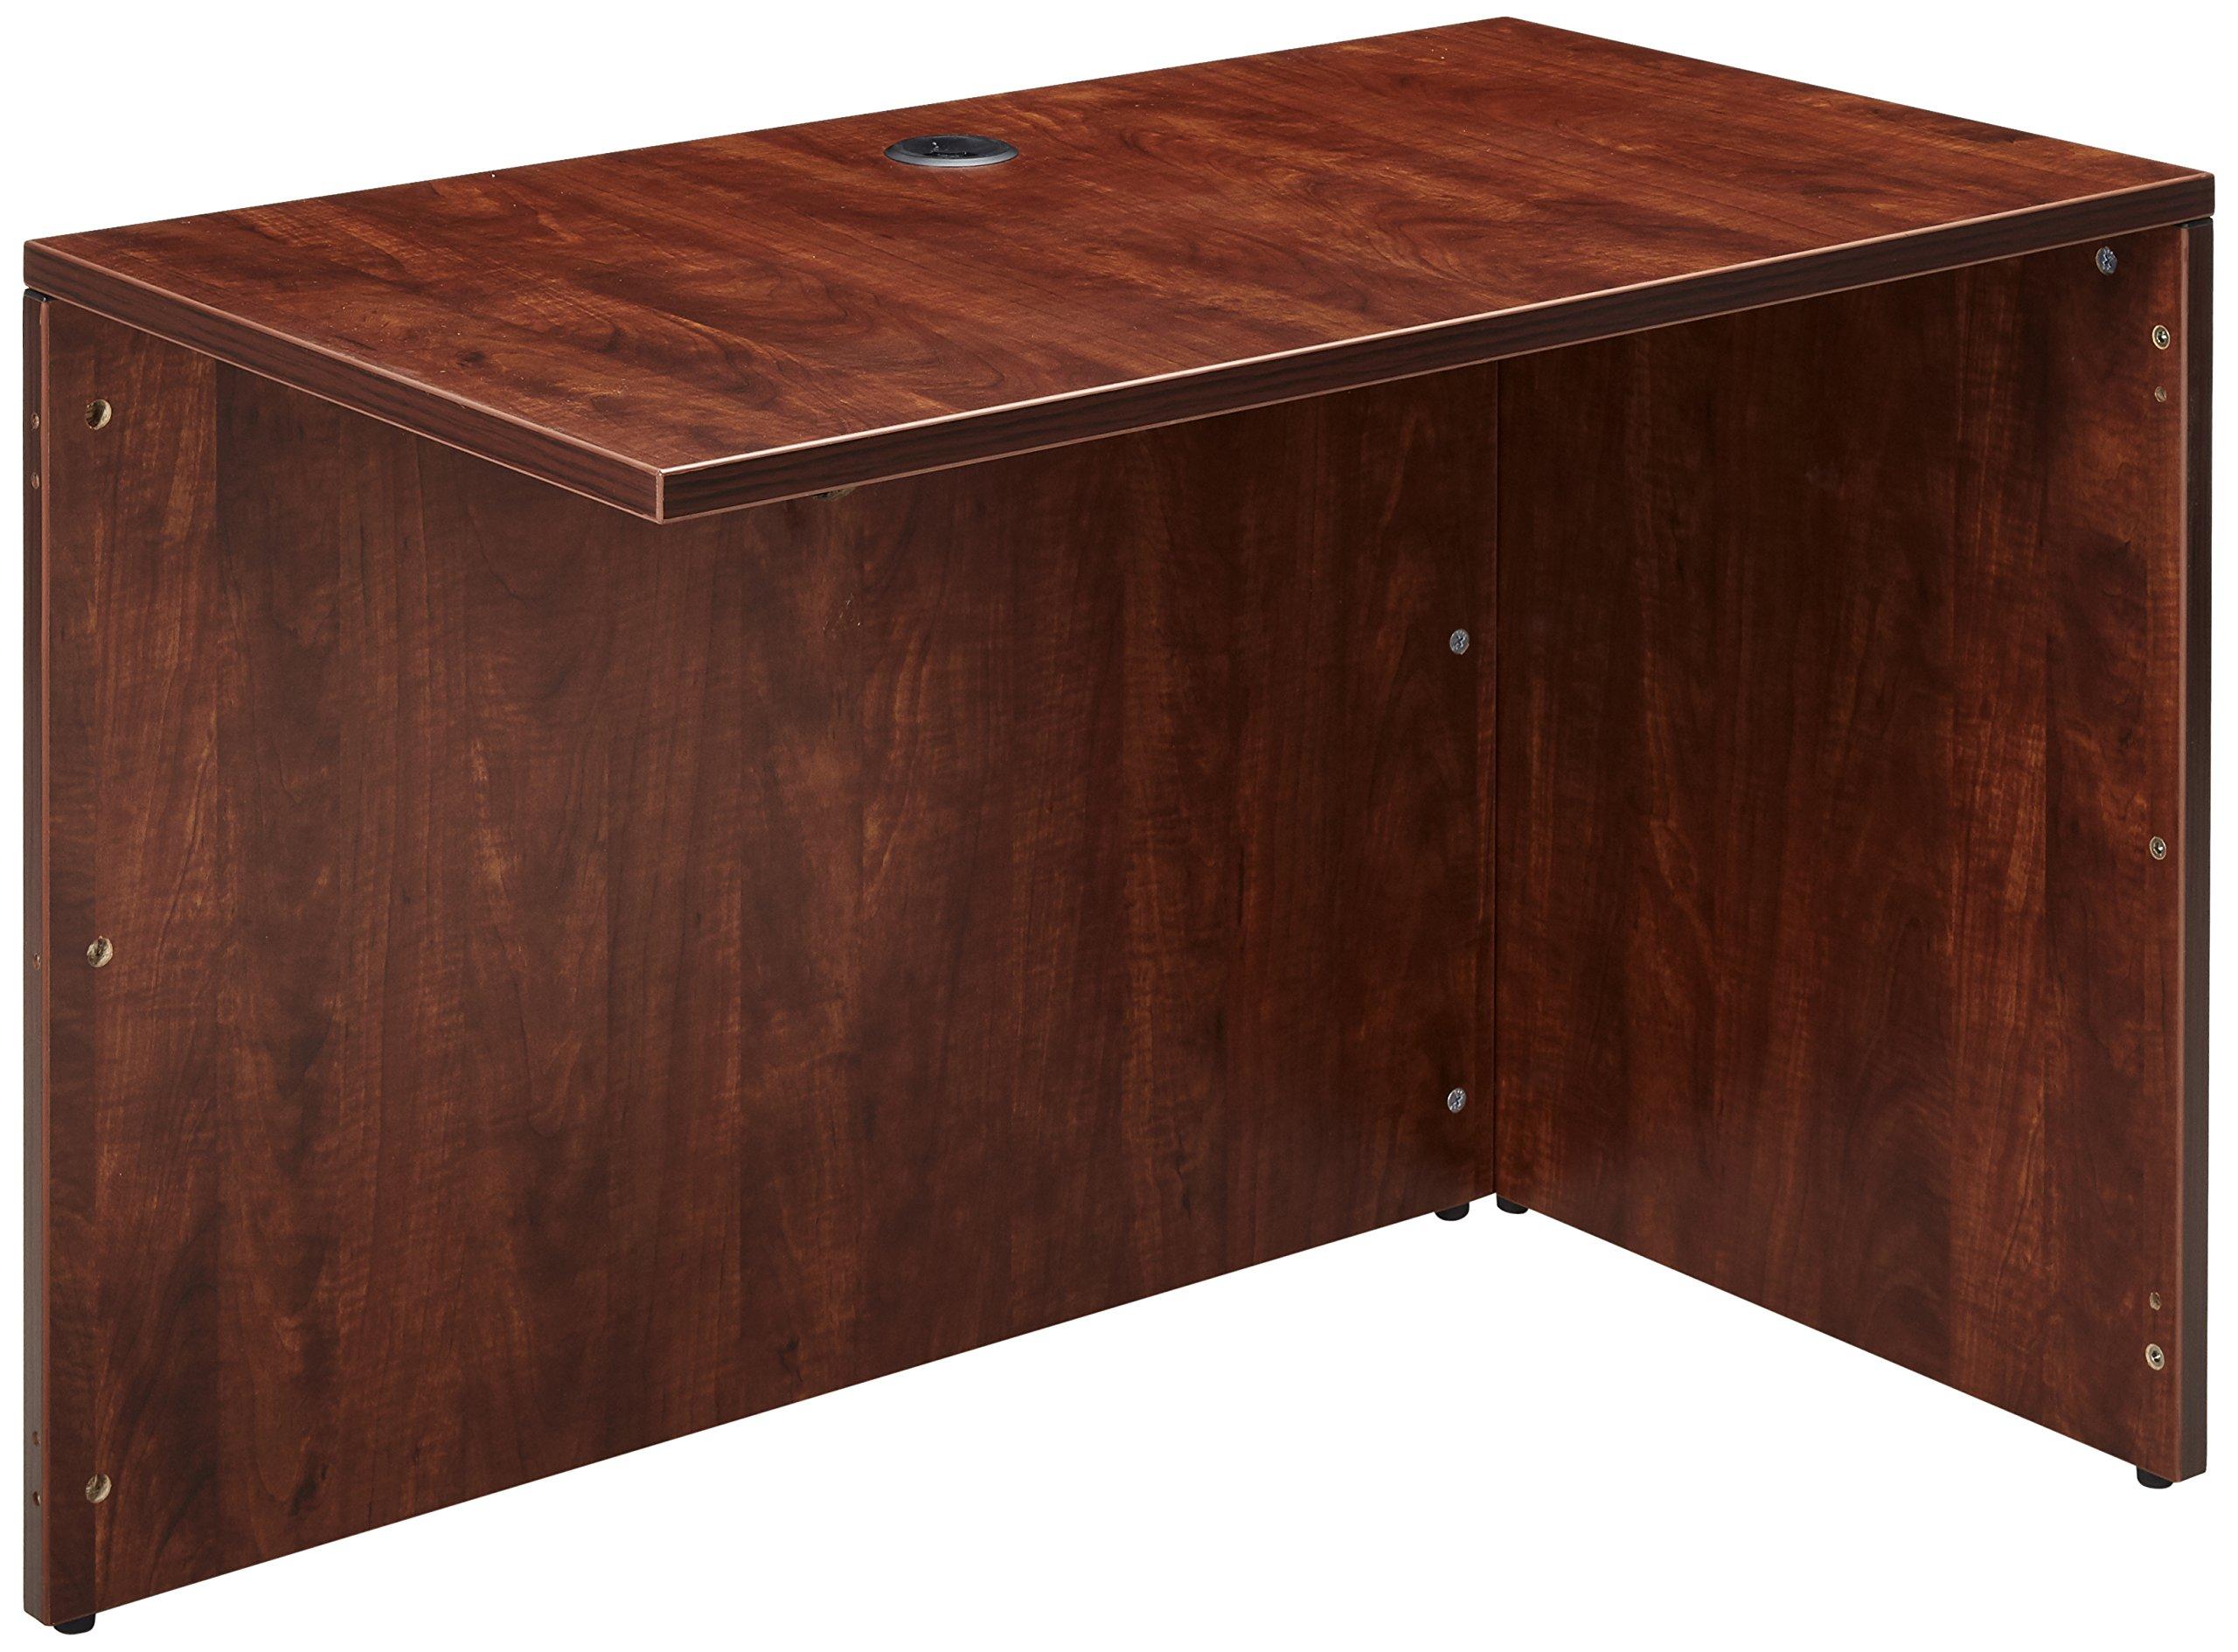 Lorell LLR69422 69000 Series Desk, Cherry